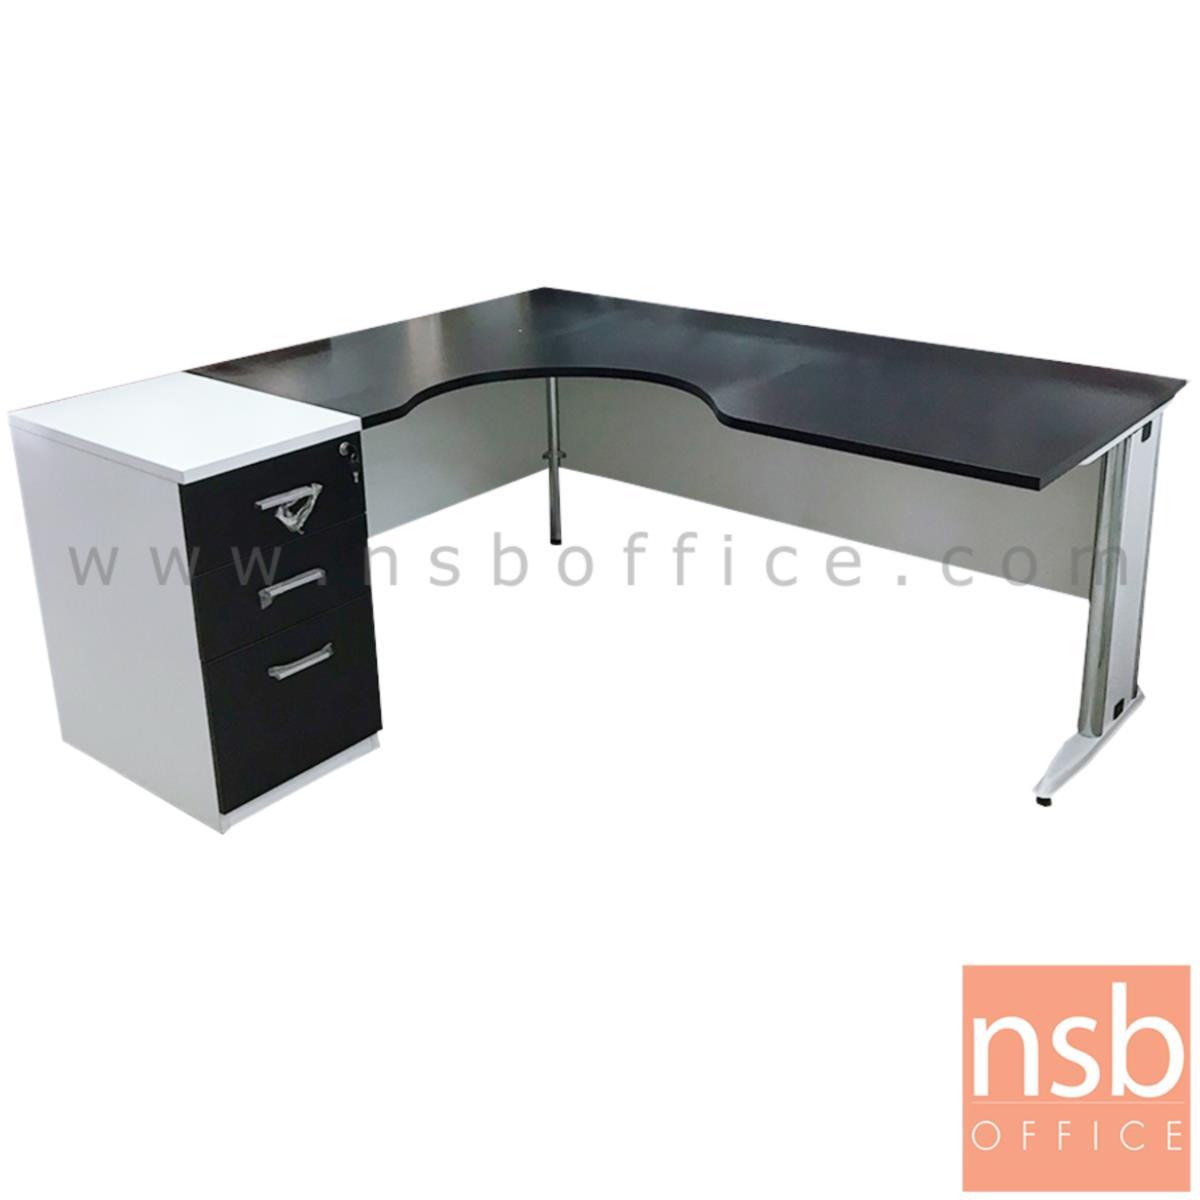 L10A203:โต๊ะผู้บริหารตัวแอลหน้าโค้งเว้า 3 ลิ้นชัก   ขนาด 160W1*180W2 cm. ขาเหล็ก